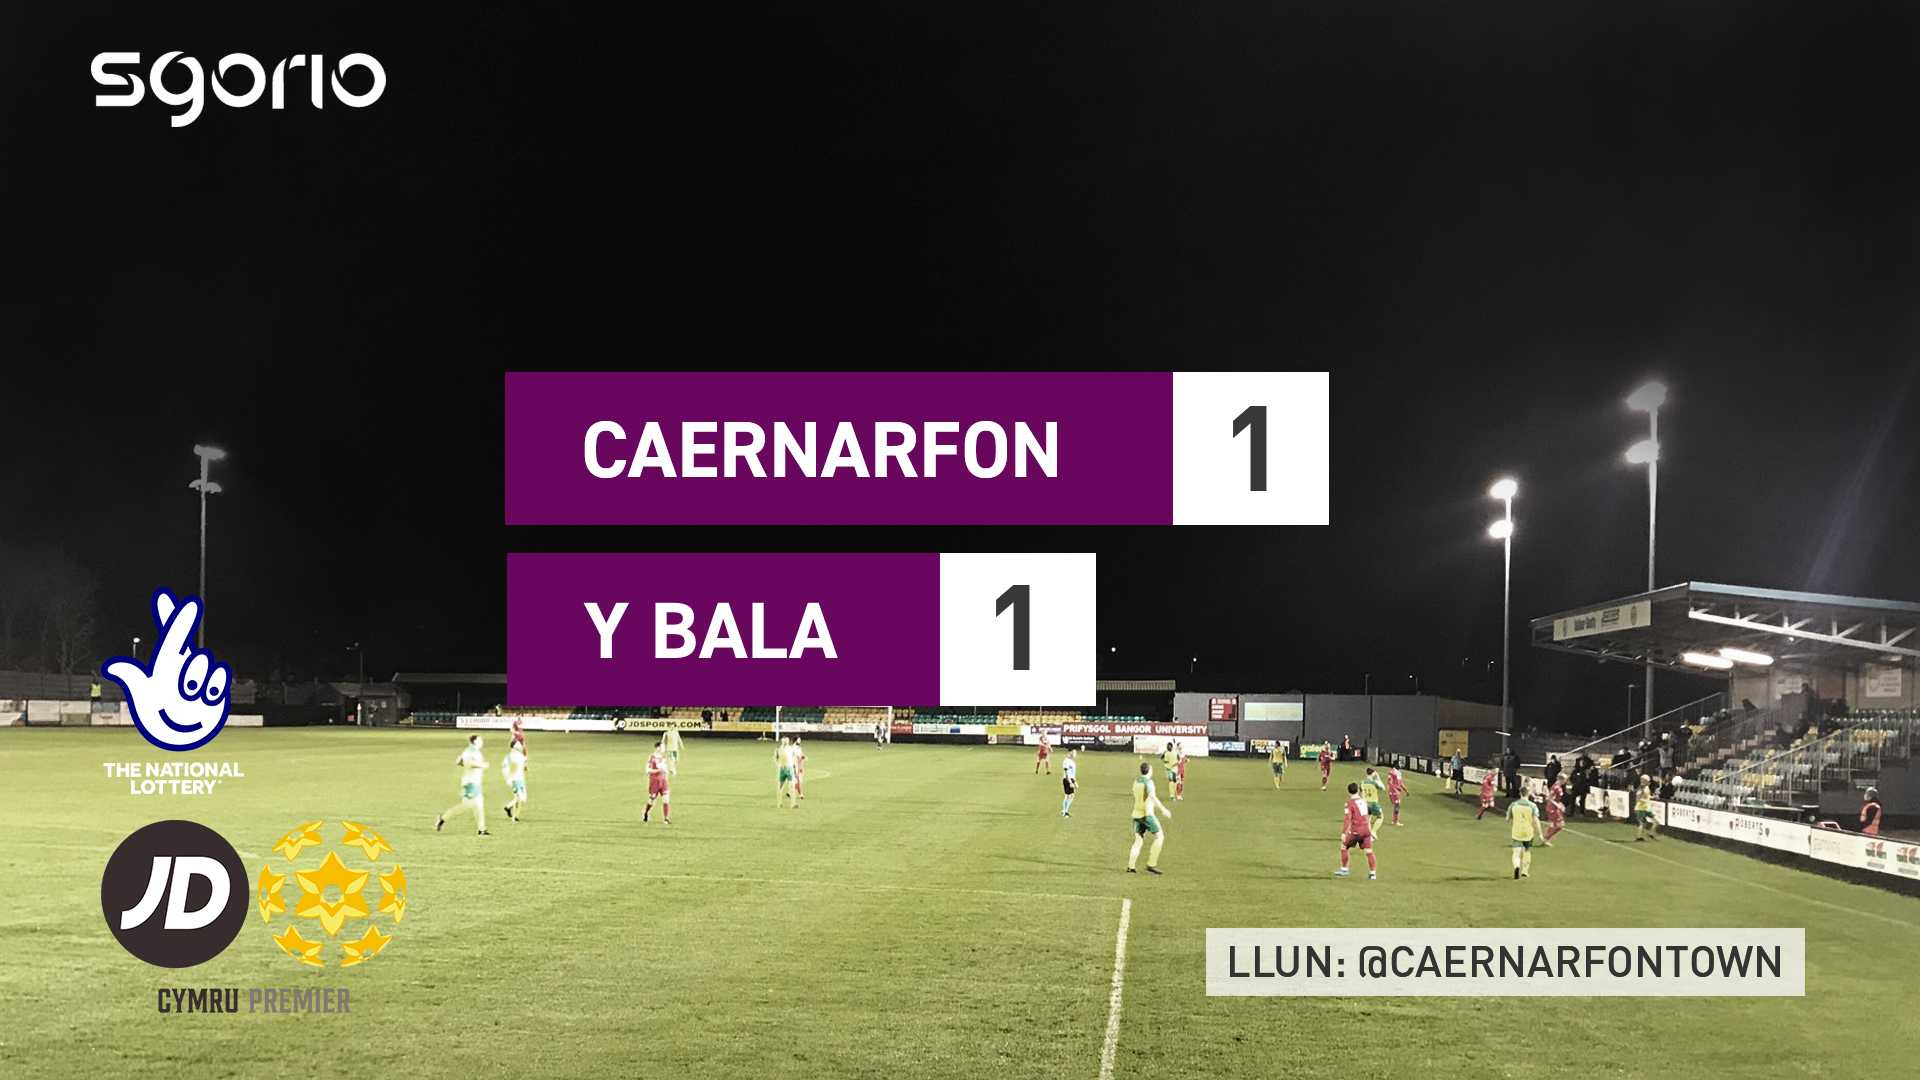 Caernarfon 1-1 Y Bala